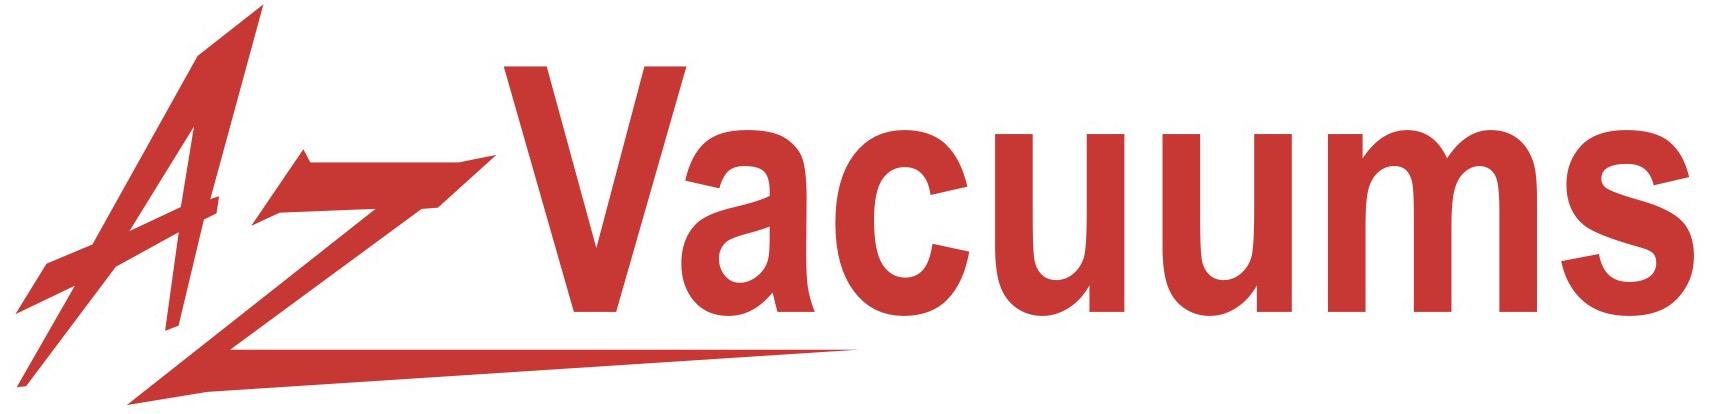 Vacuums Phoenix & Glendale AZ | Vacuum Repair Phoenix & Glendale AZ